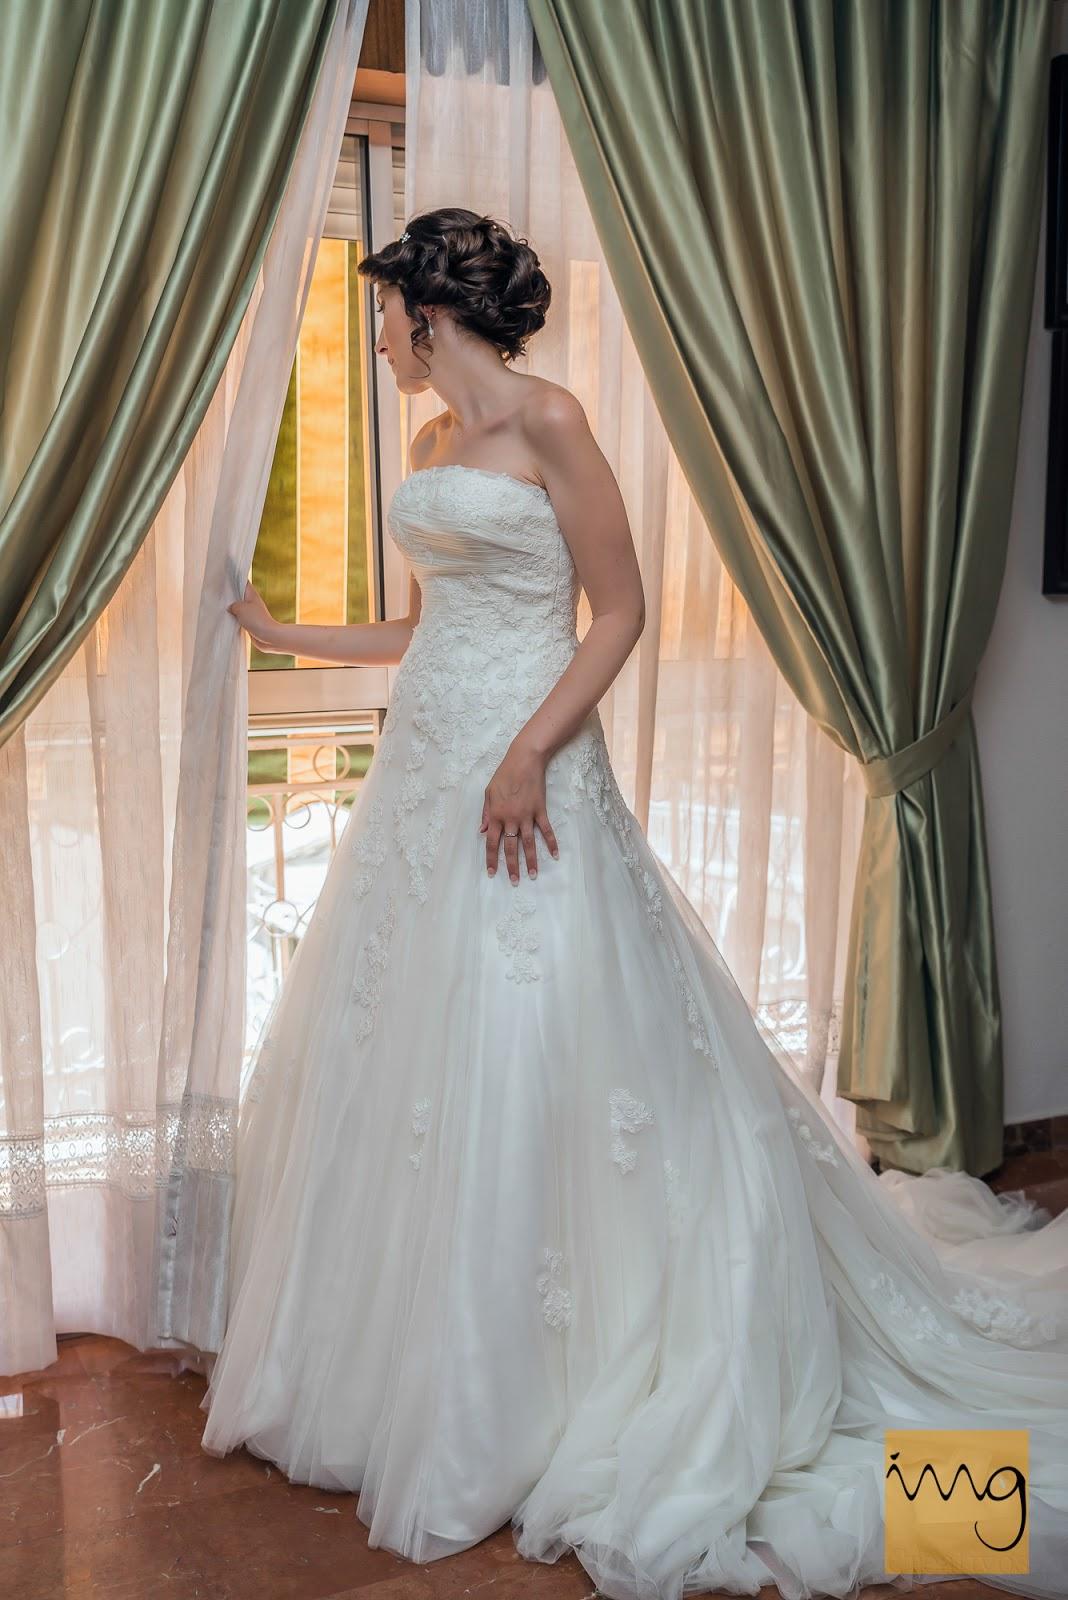 Fotografía de la novia mirando por la ventana